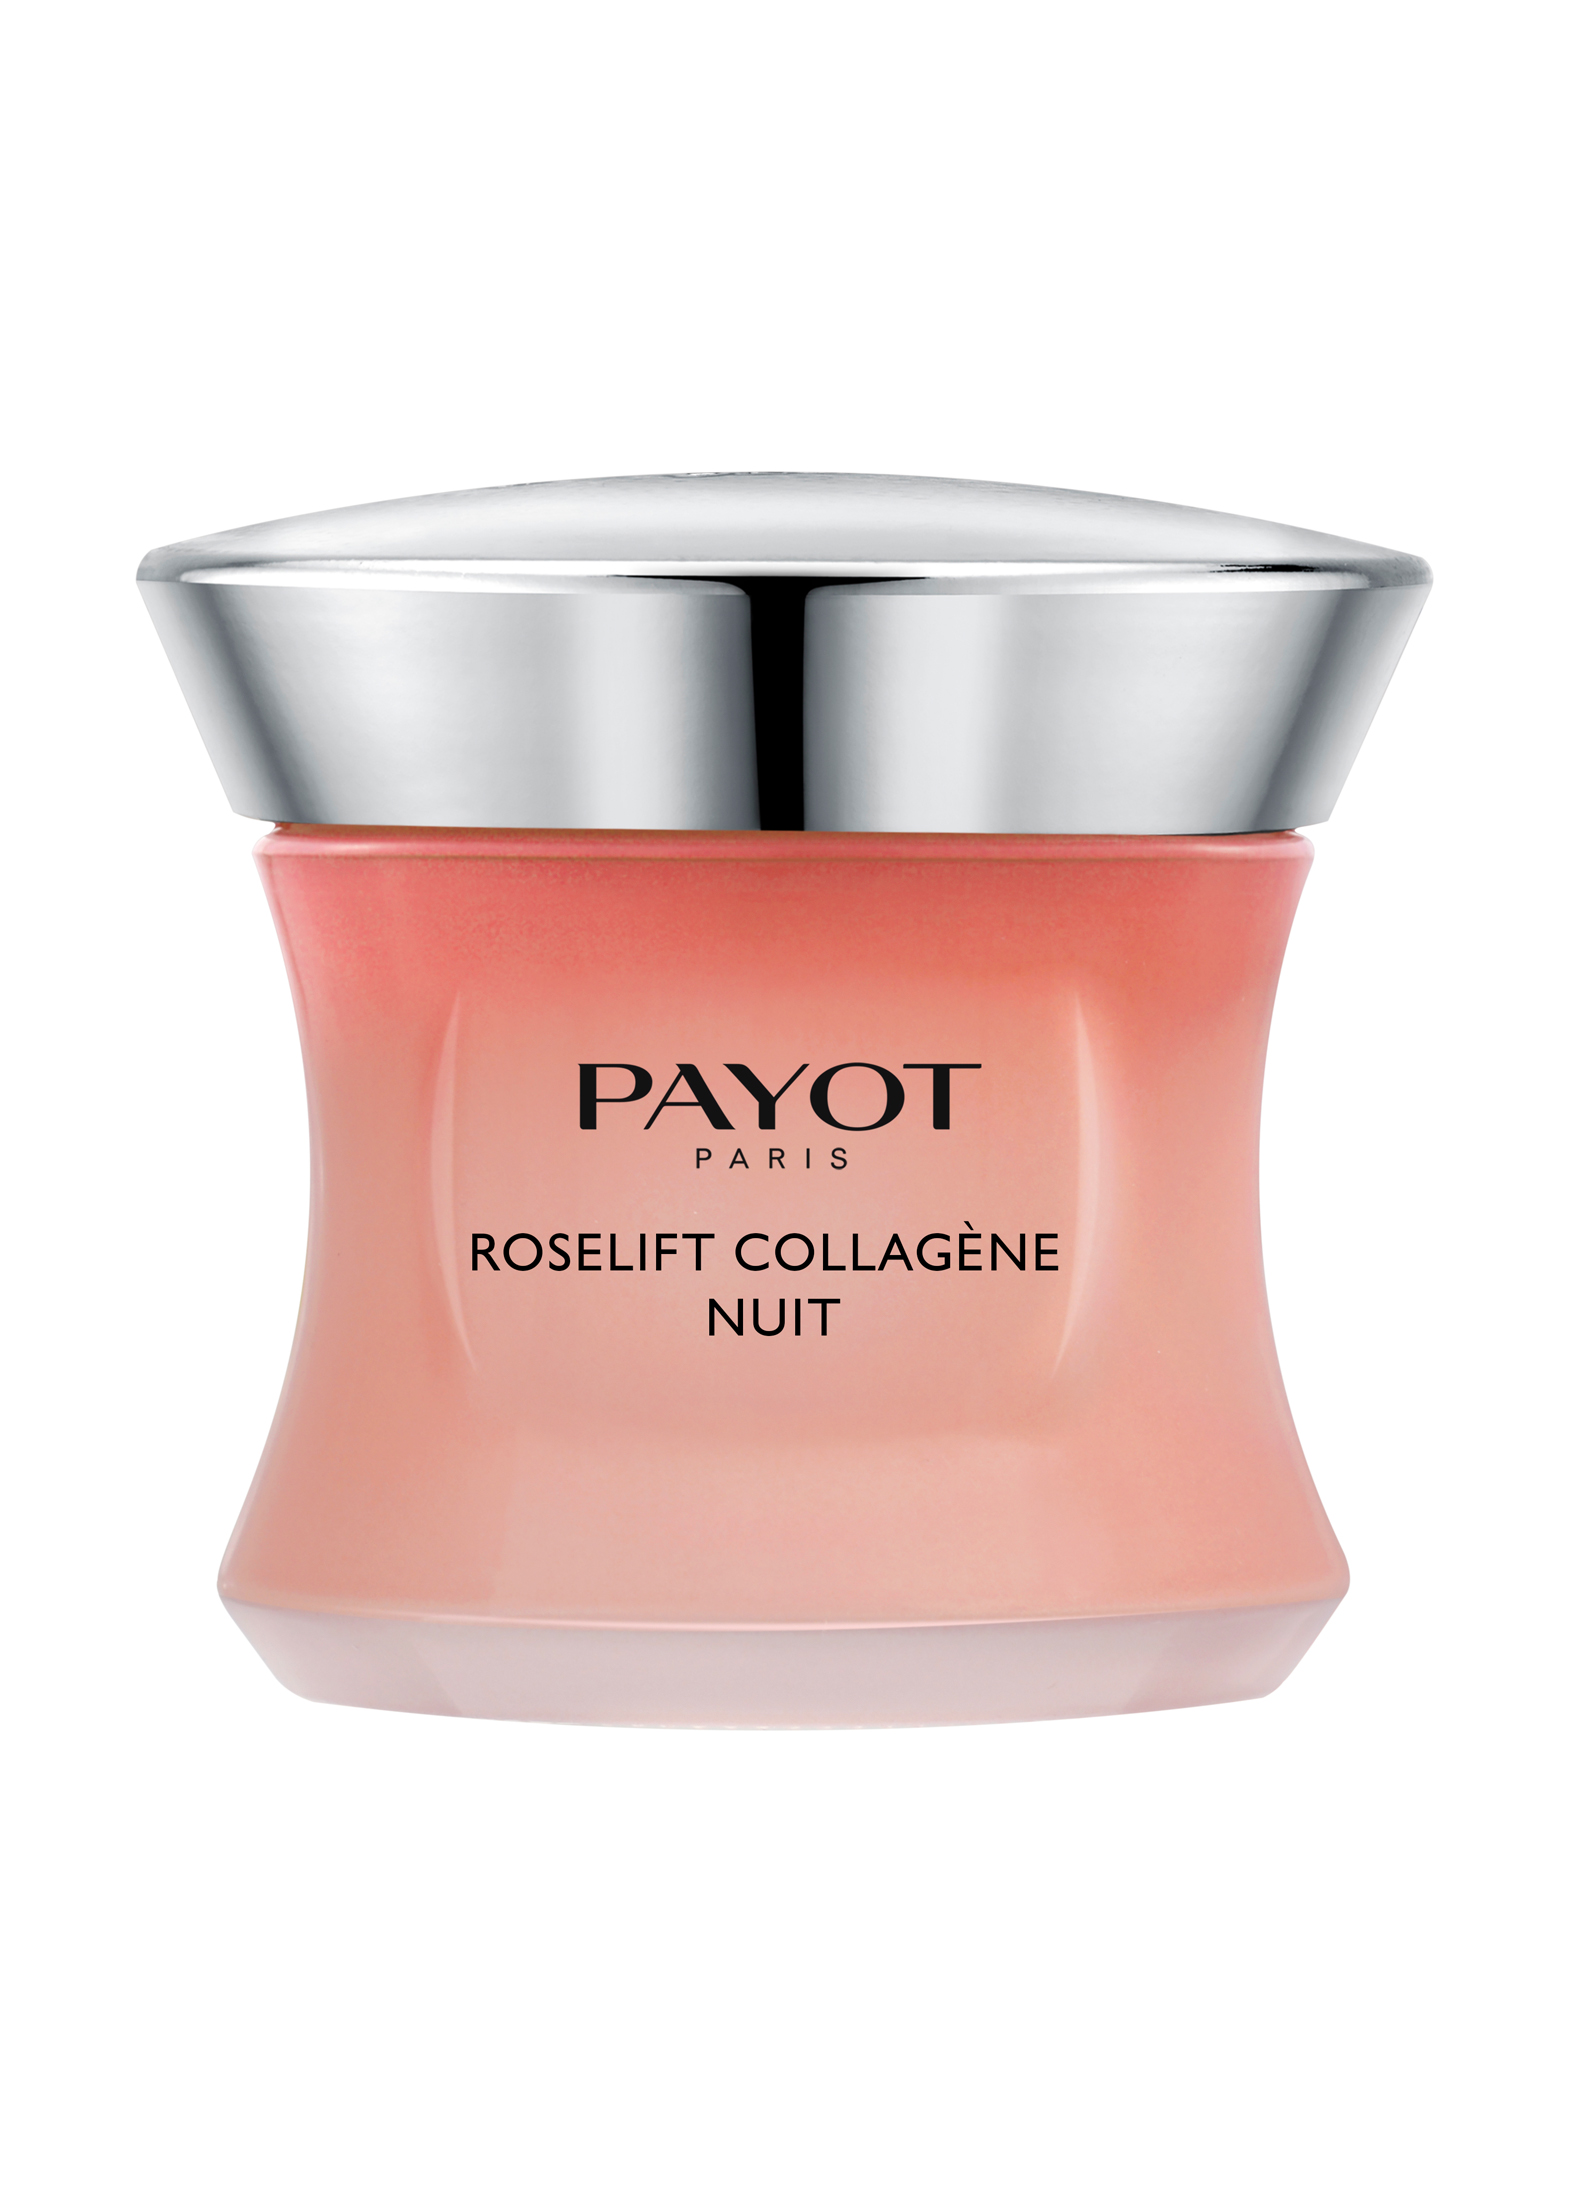 Roselift Collagène Nuit,50ml image number 0